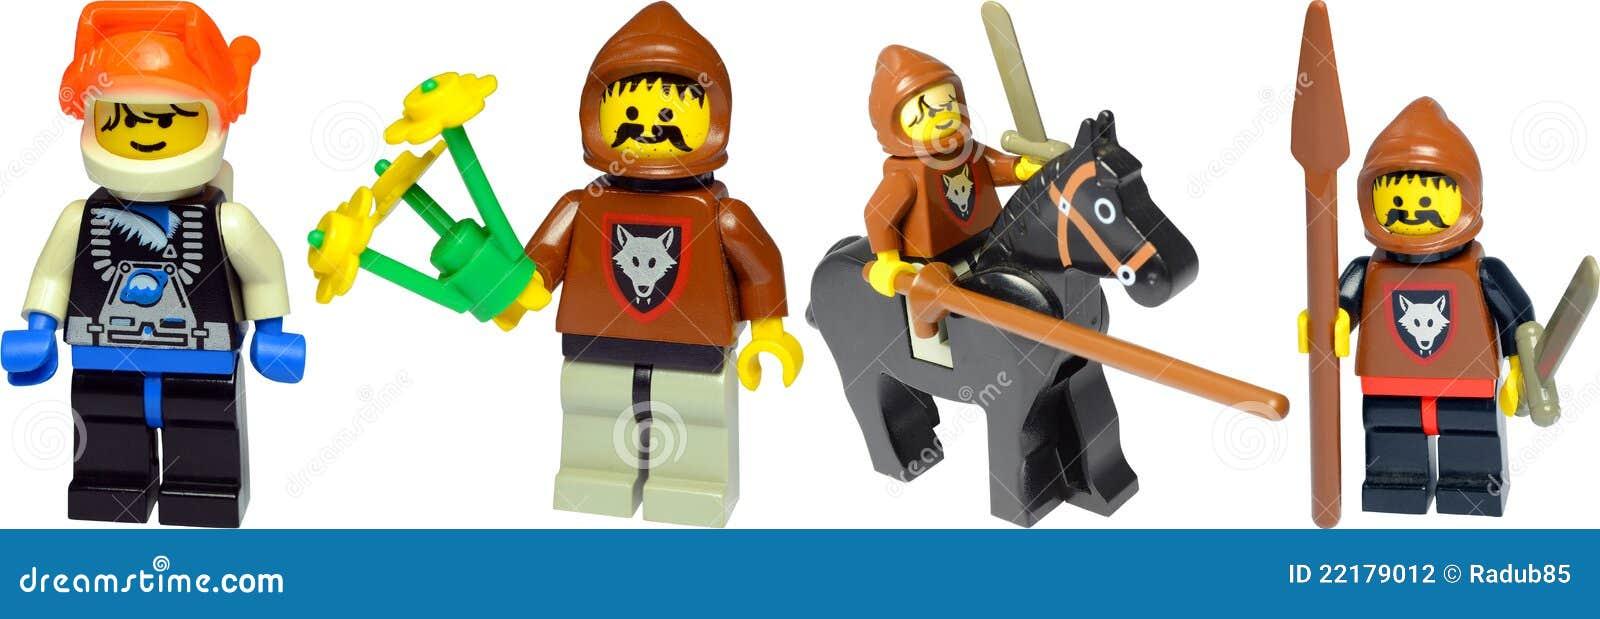 Lego χαρακτήρων